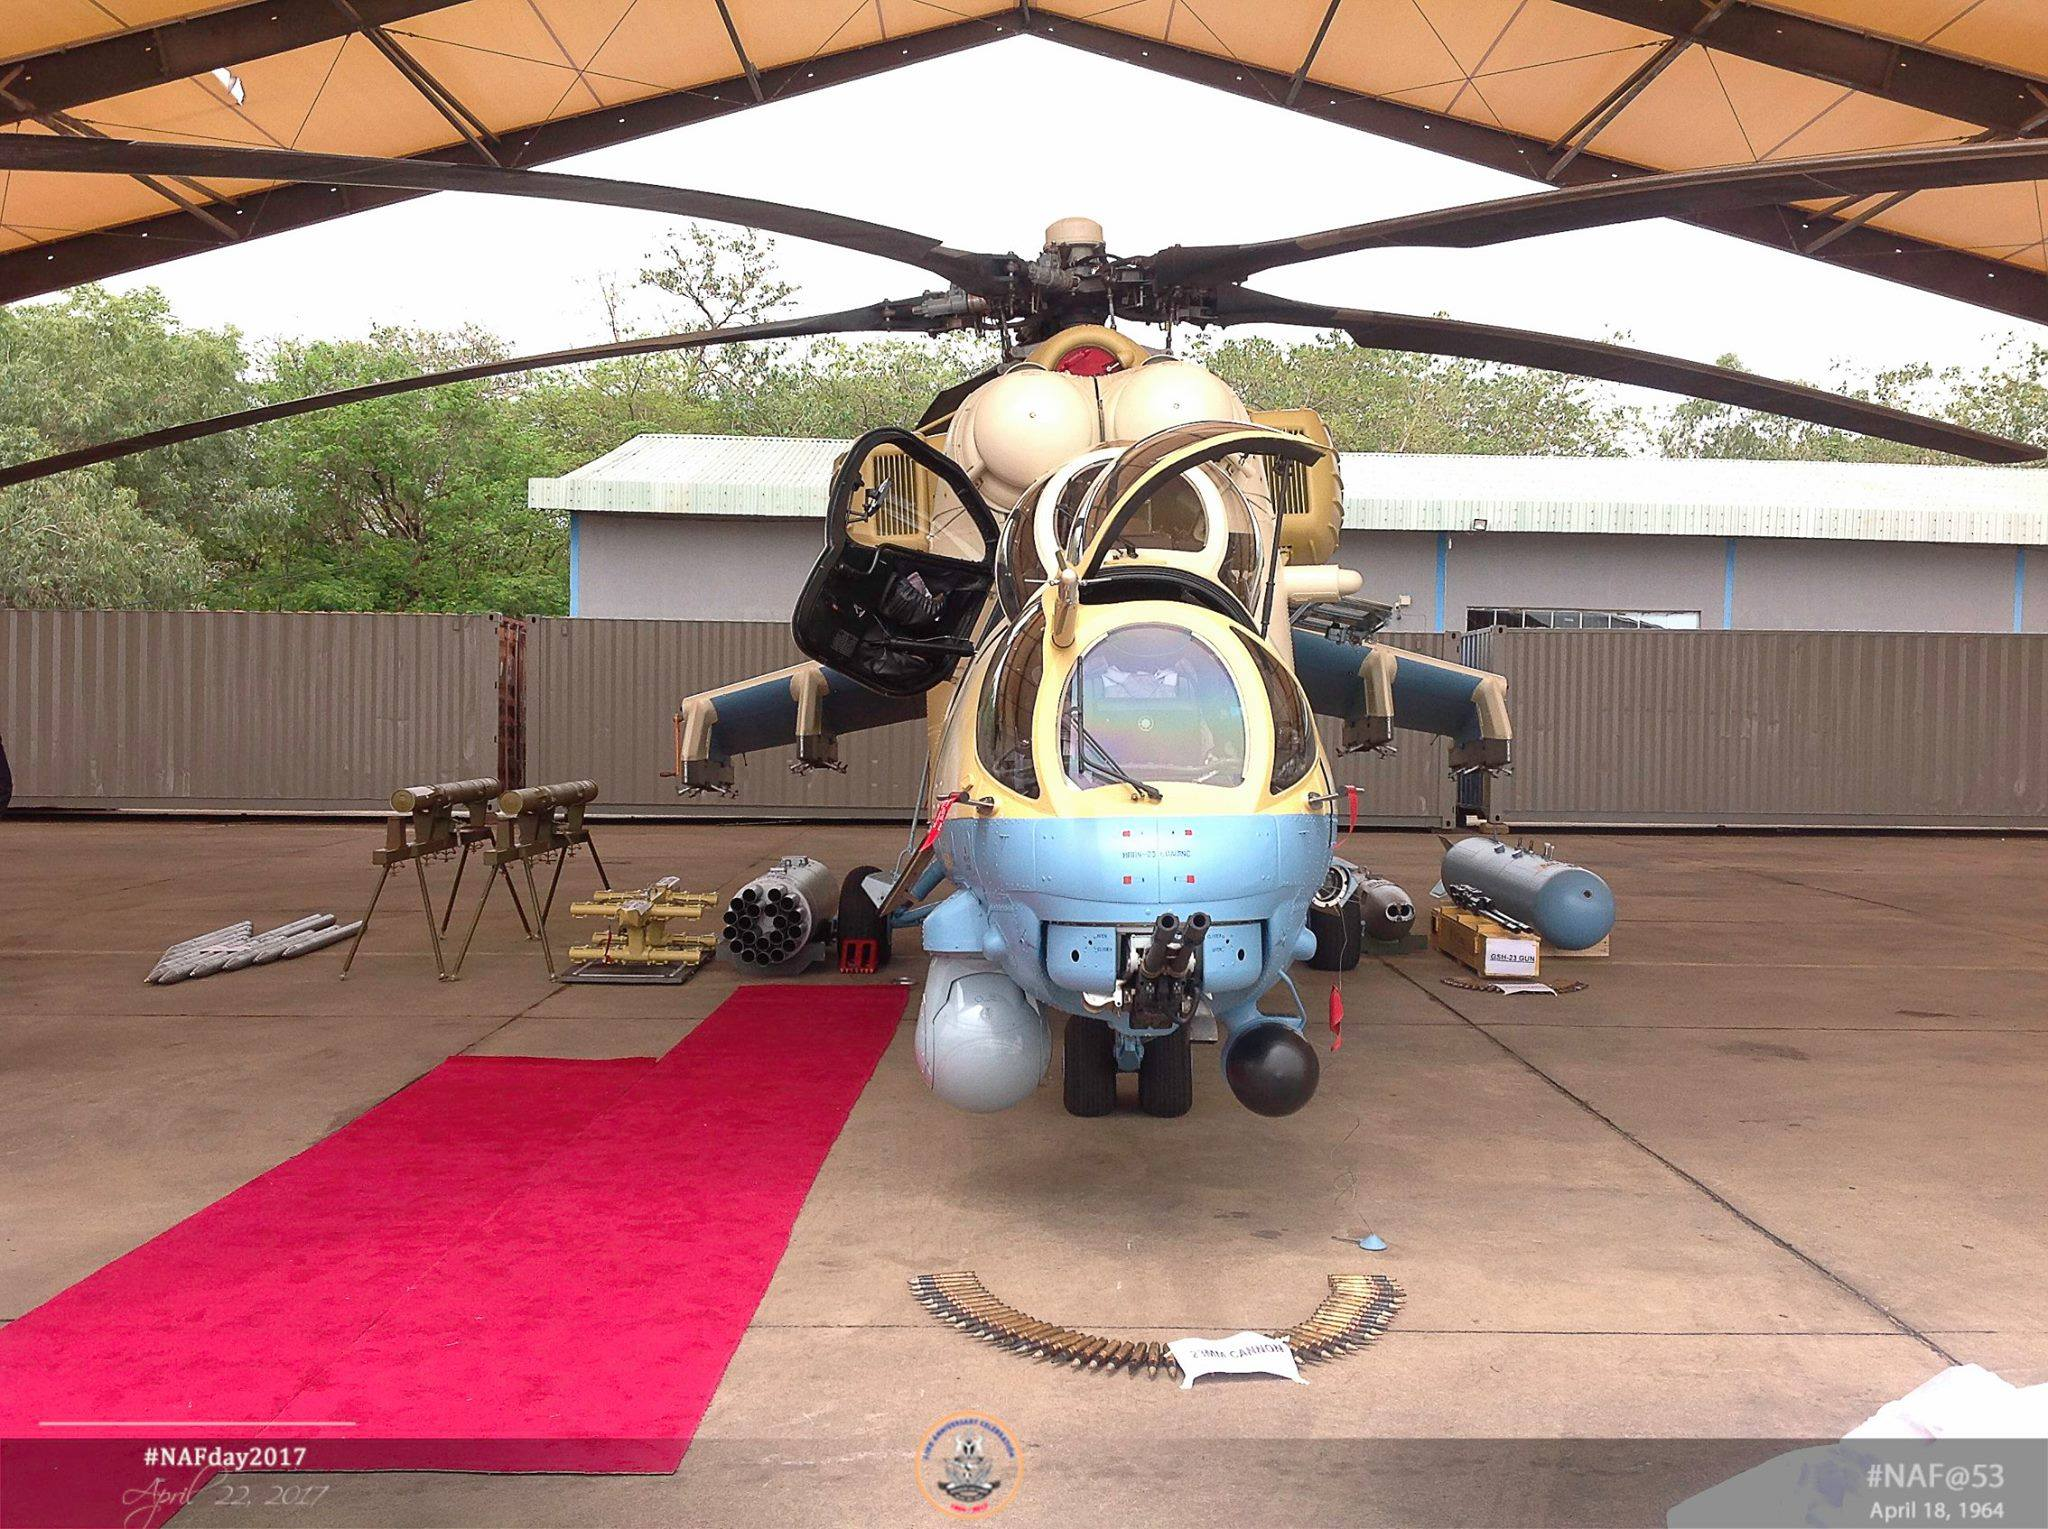 Rússia fornecerá 10 helicópteros Mi-35M para a Nigéria em 2018